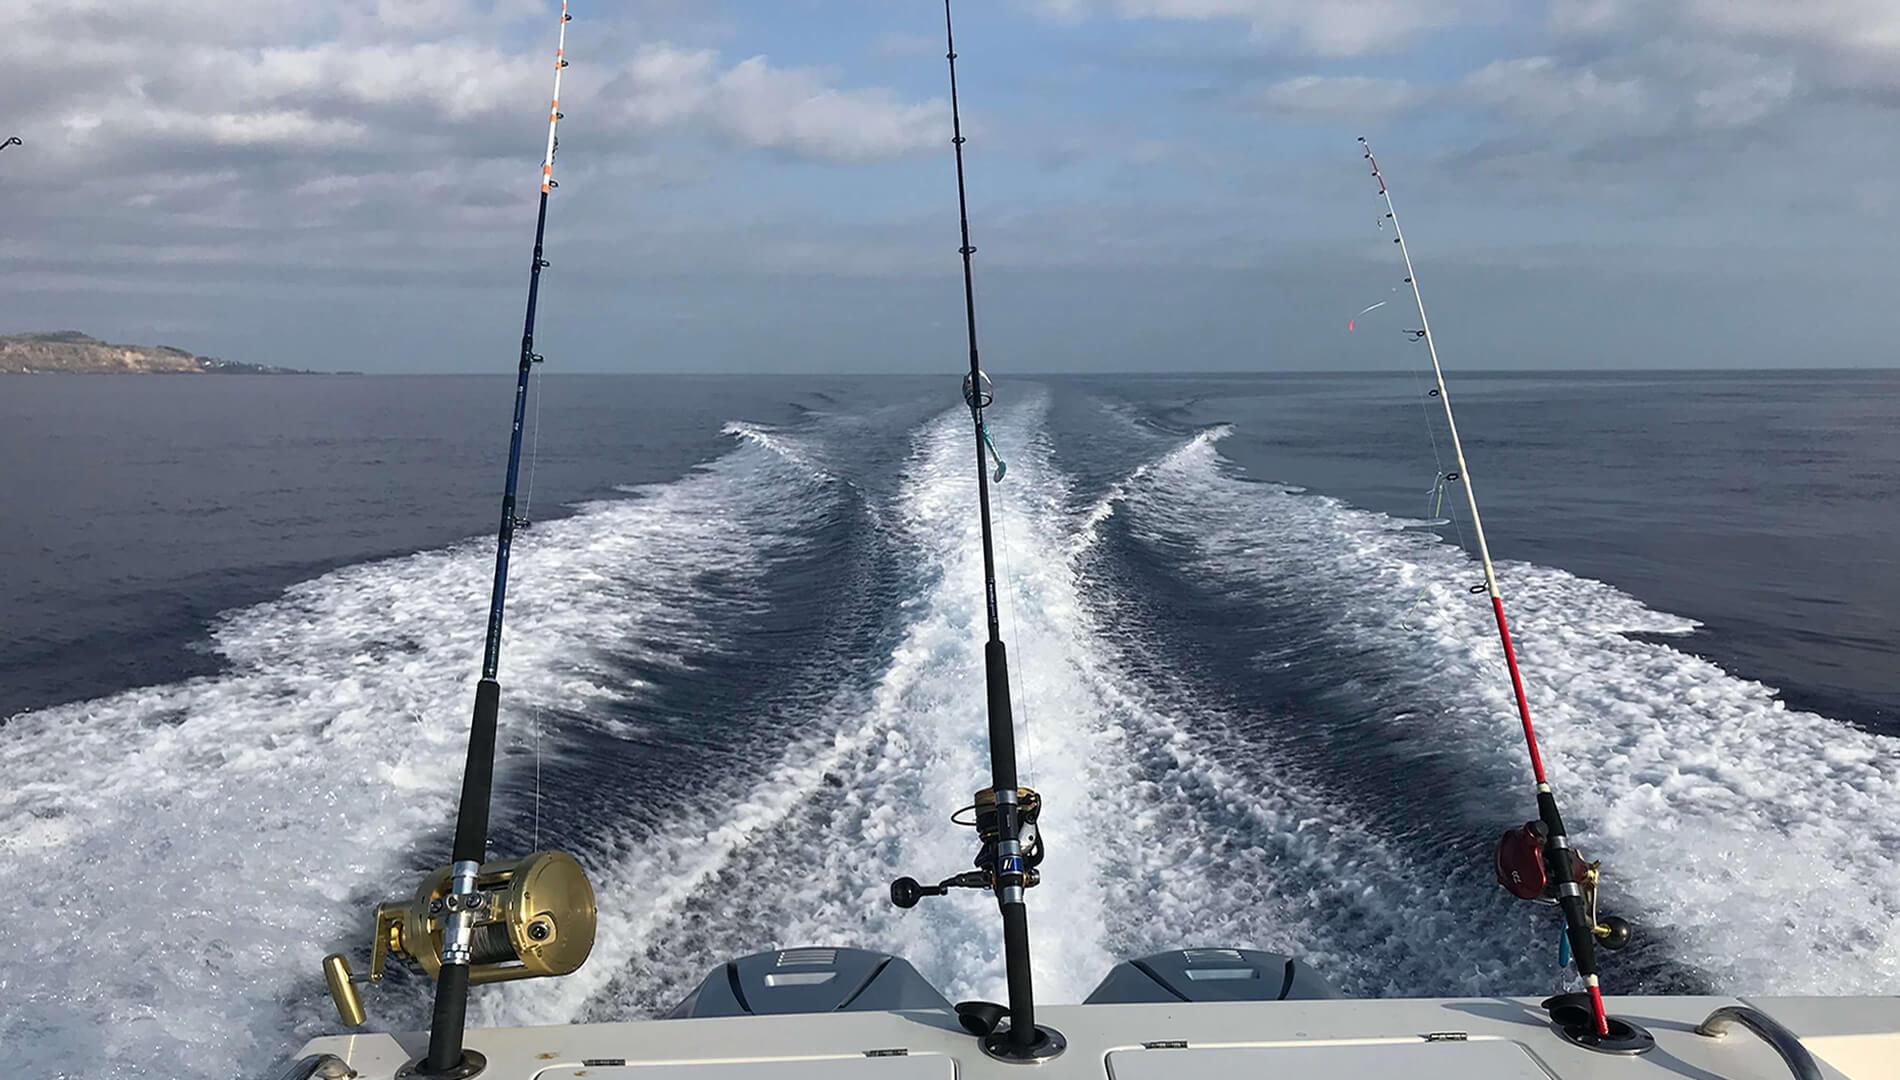 Saída de pesca, canas de pesca, loja de pesca, as melhores marcas, daiwa, shimano, deepliner, xesta, tict...